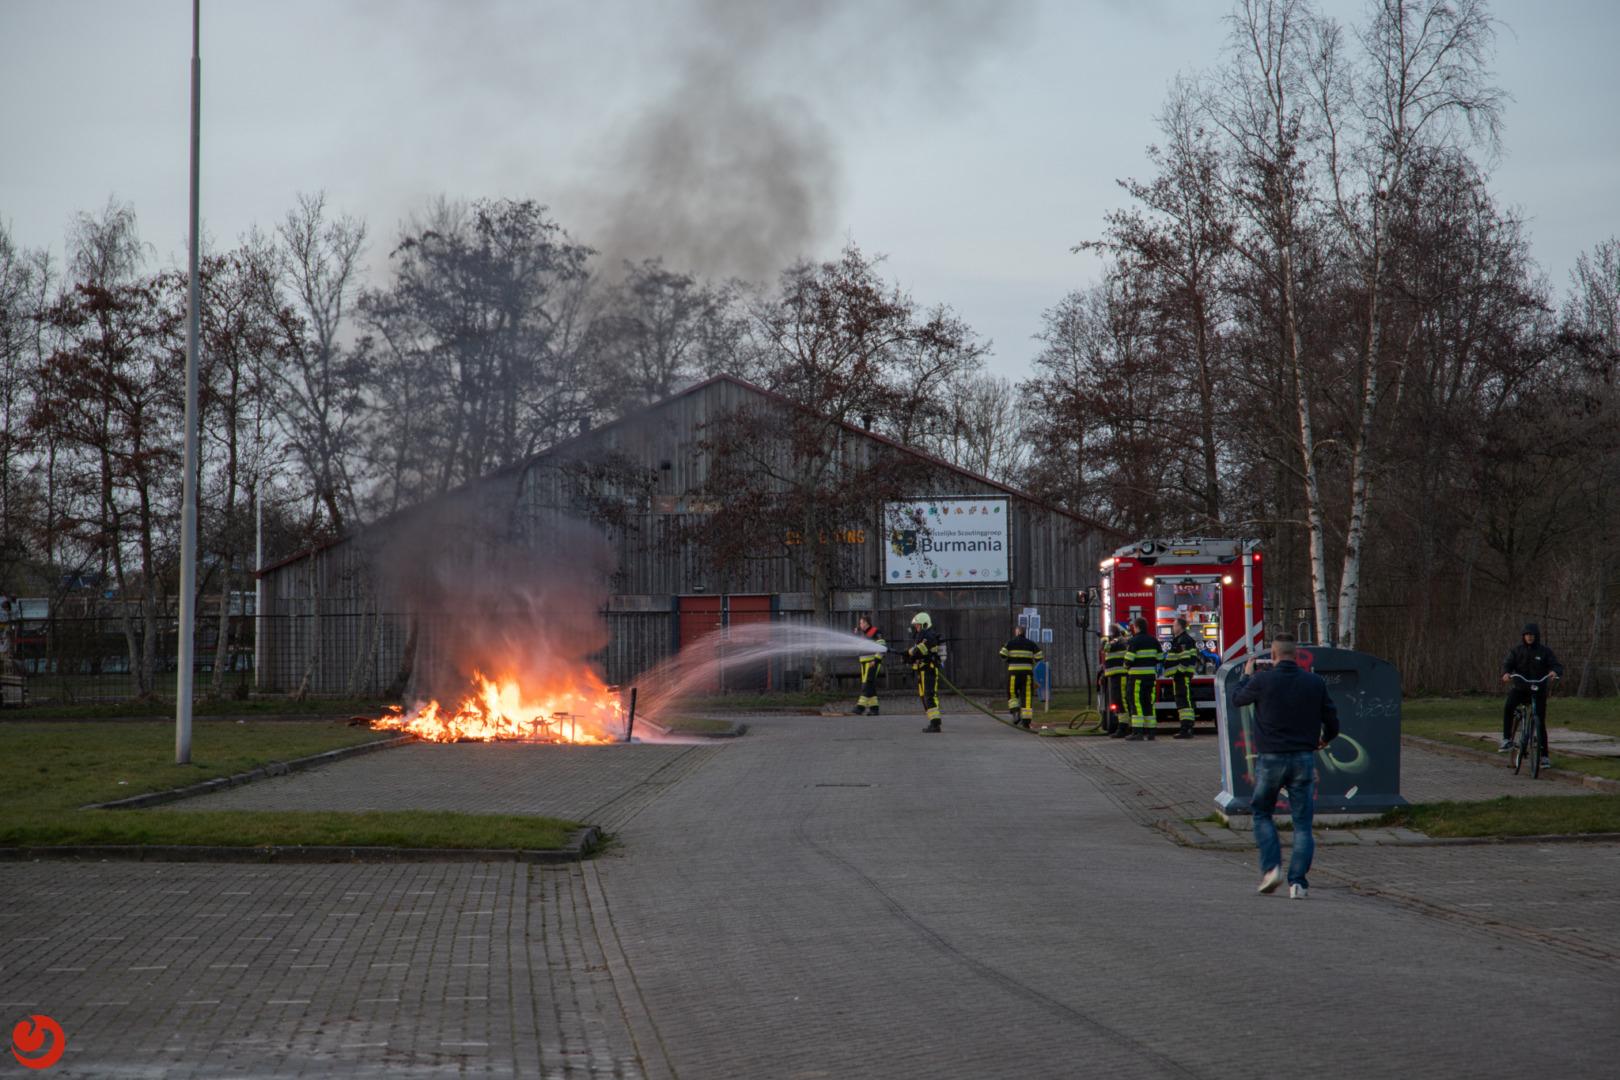 Melding autobrand blijkt bult afval